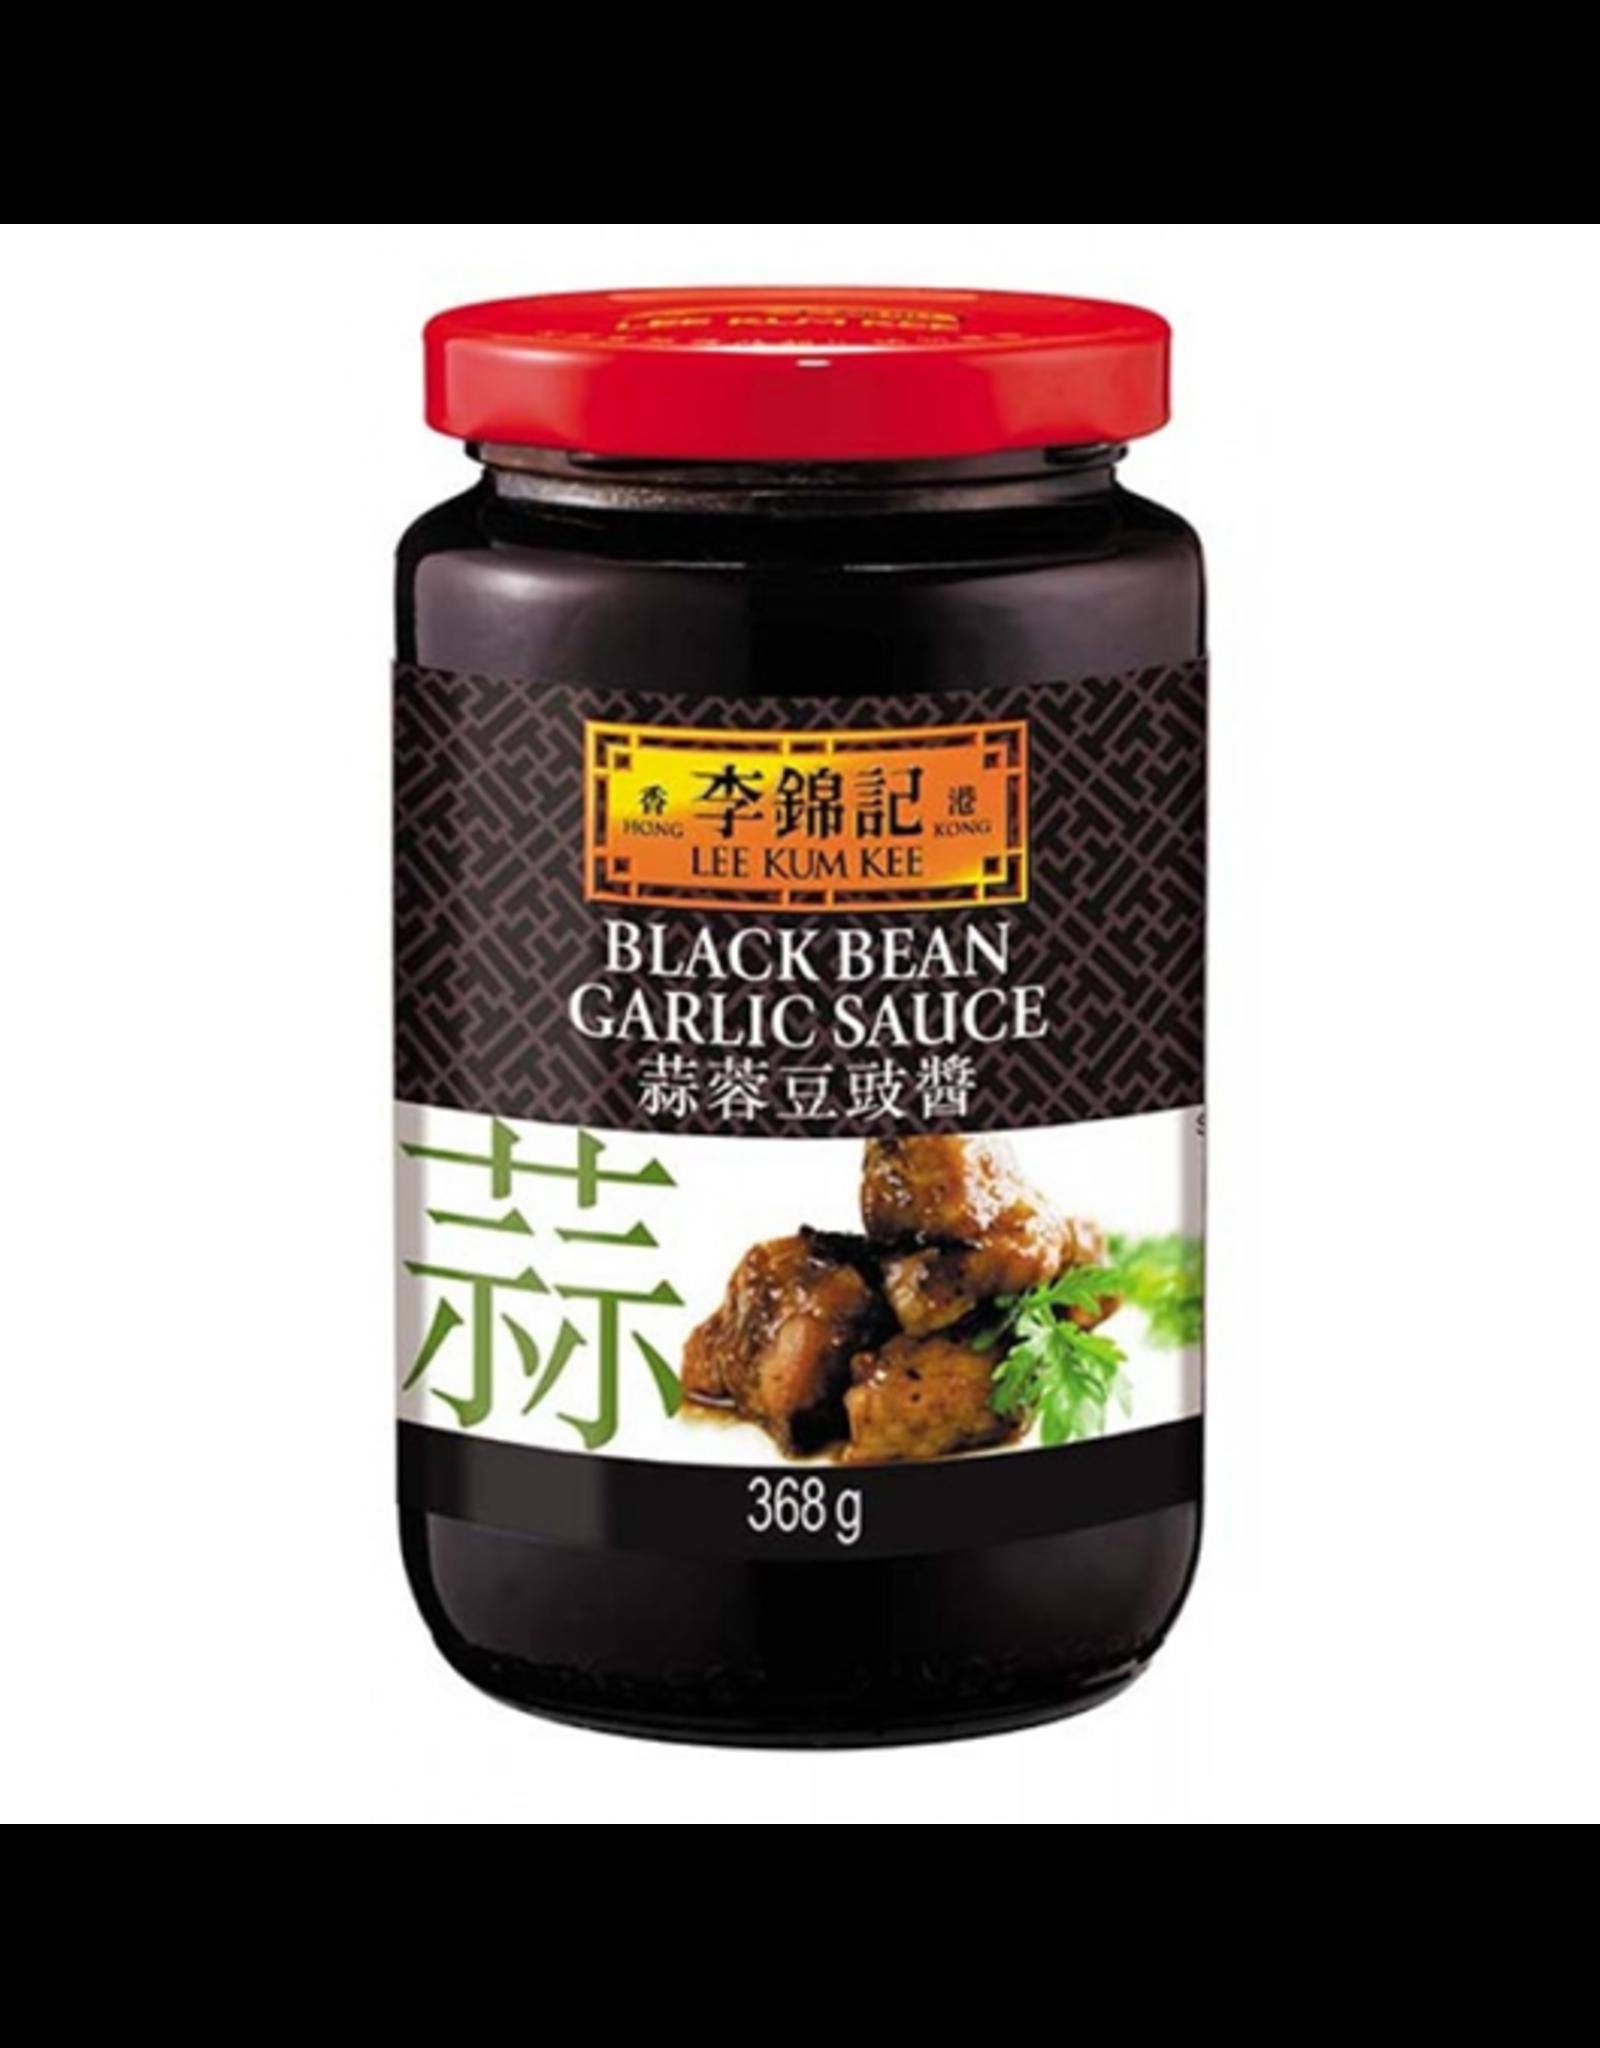 Lee Kum Kee Black Bean Garlic sauce